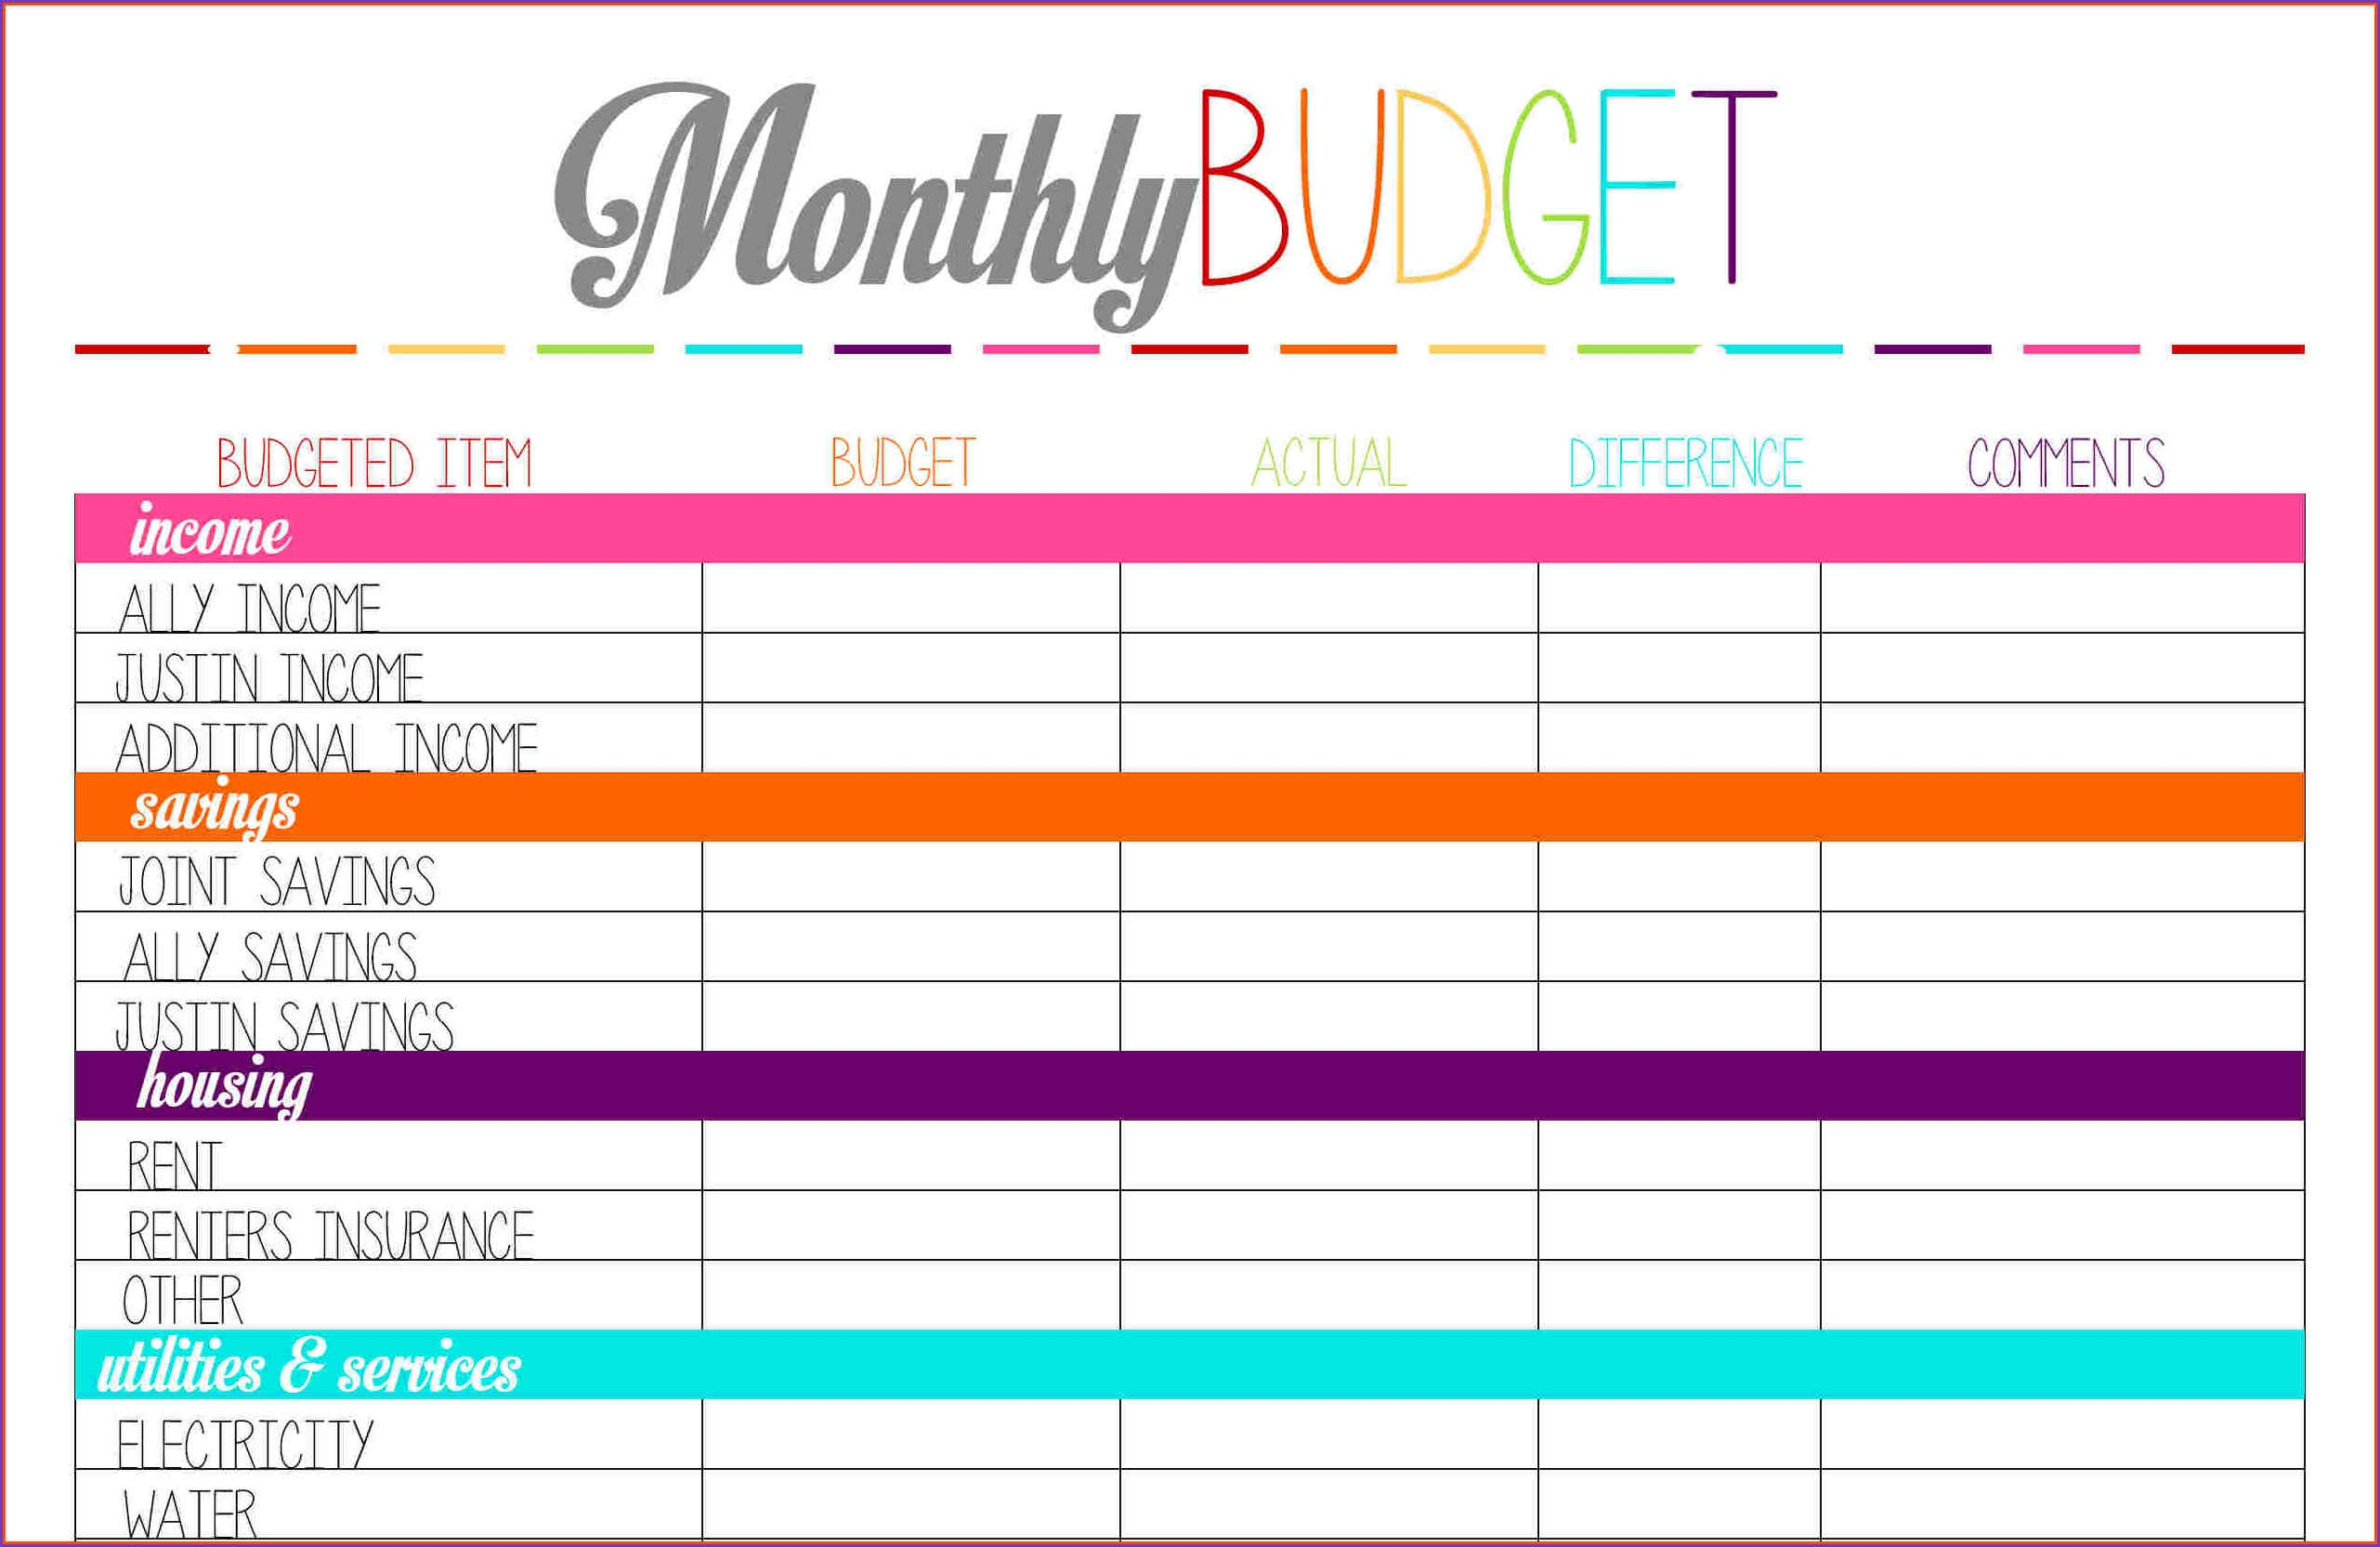 Family Et Forms Free Reunion Spreadsheet Online Planner Printable - Free Online Printable Budget Worksheet